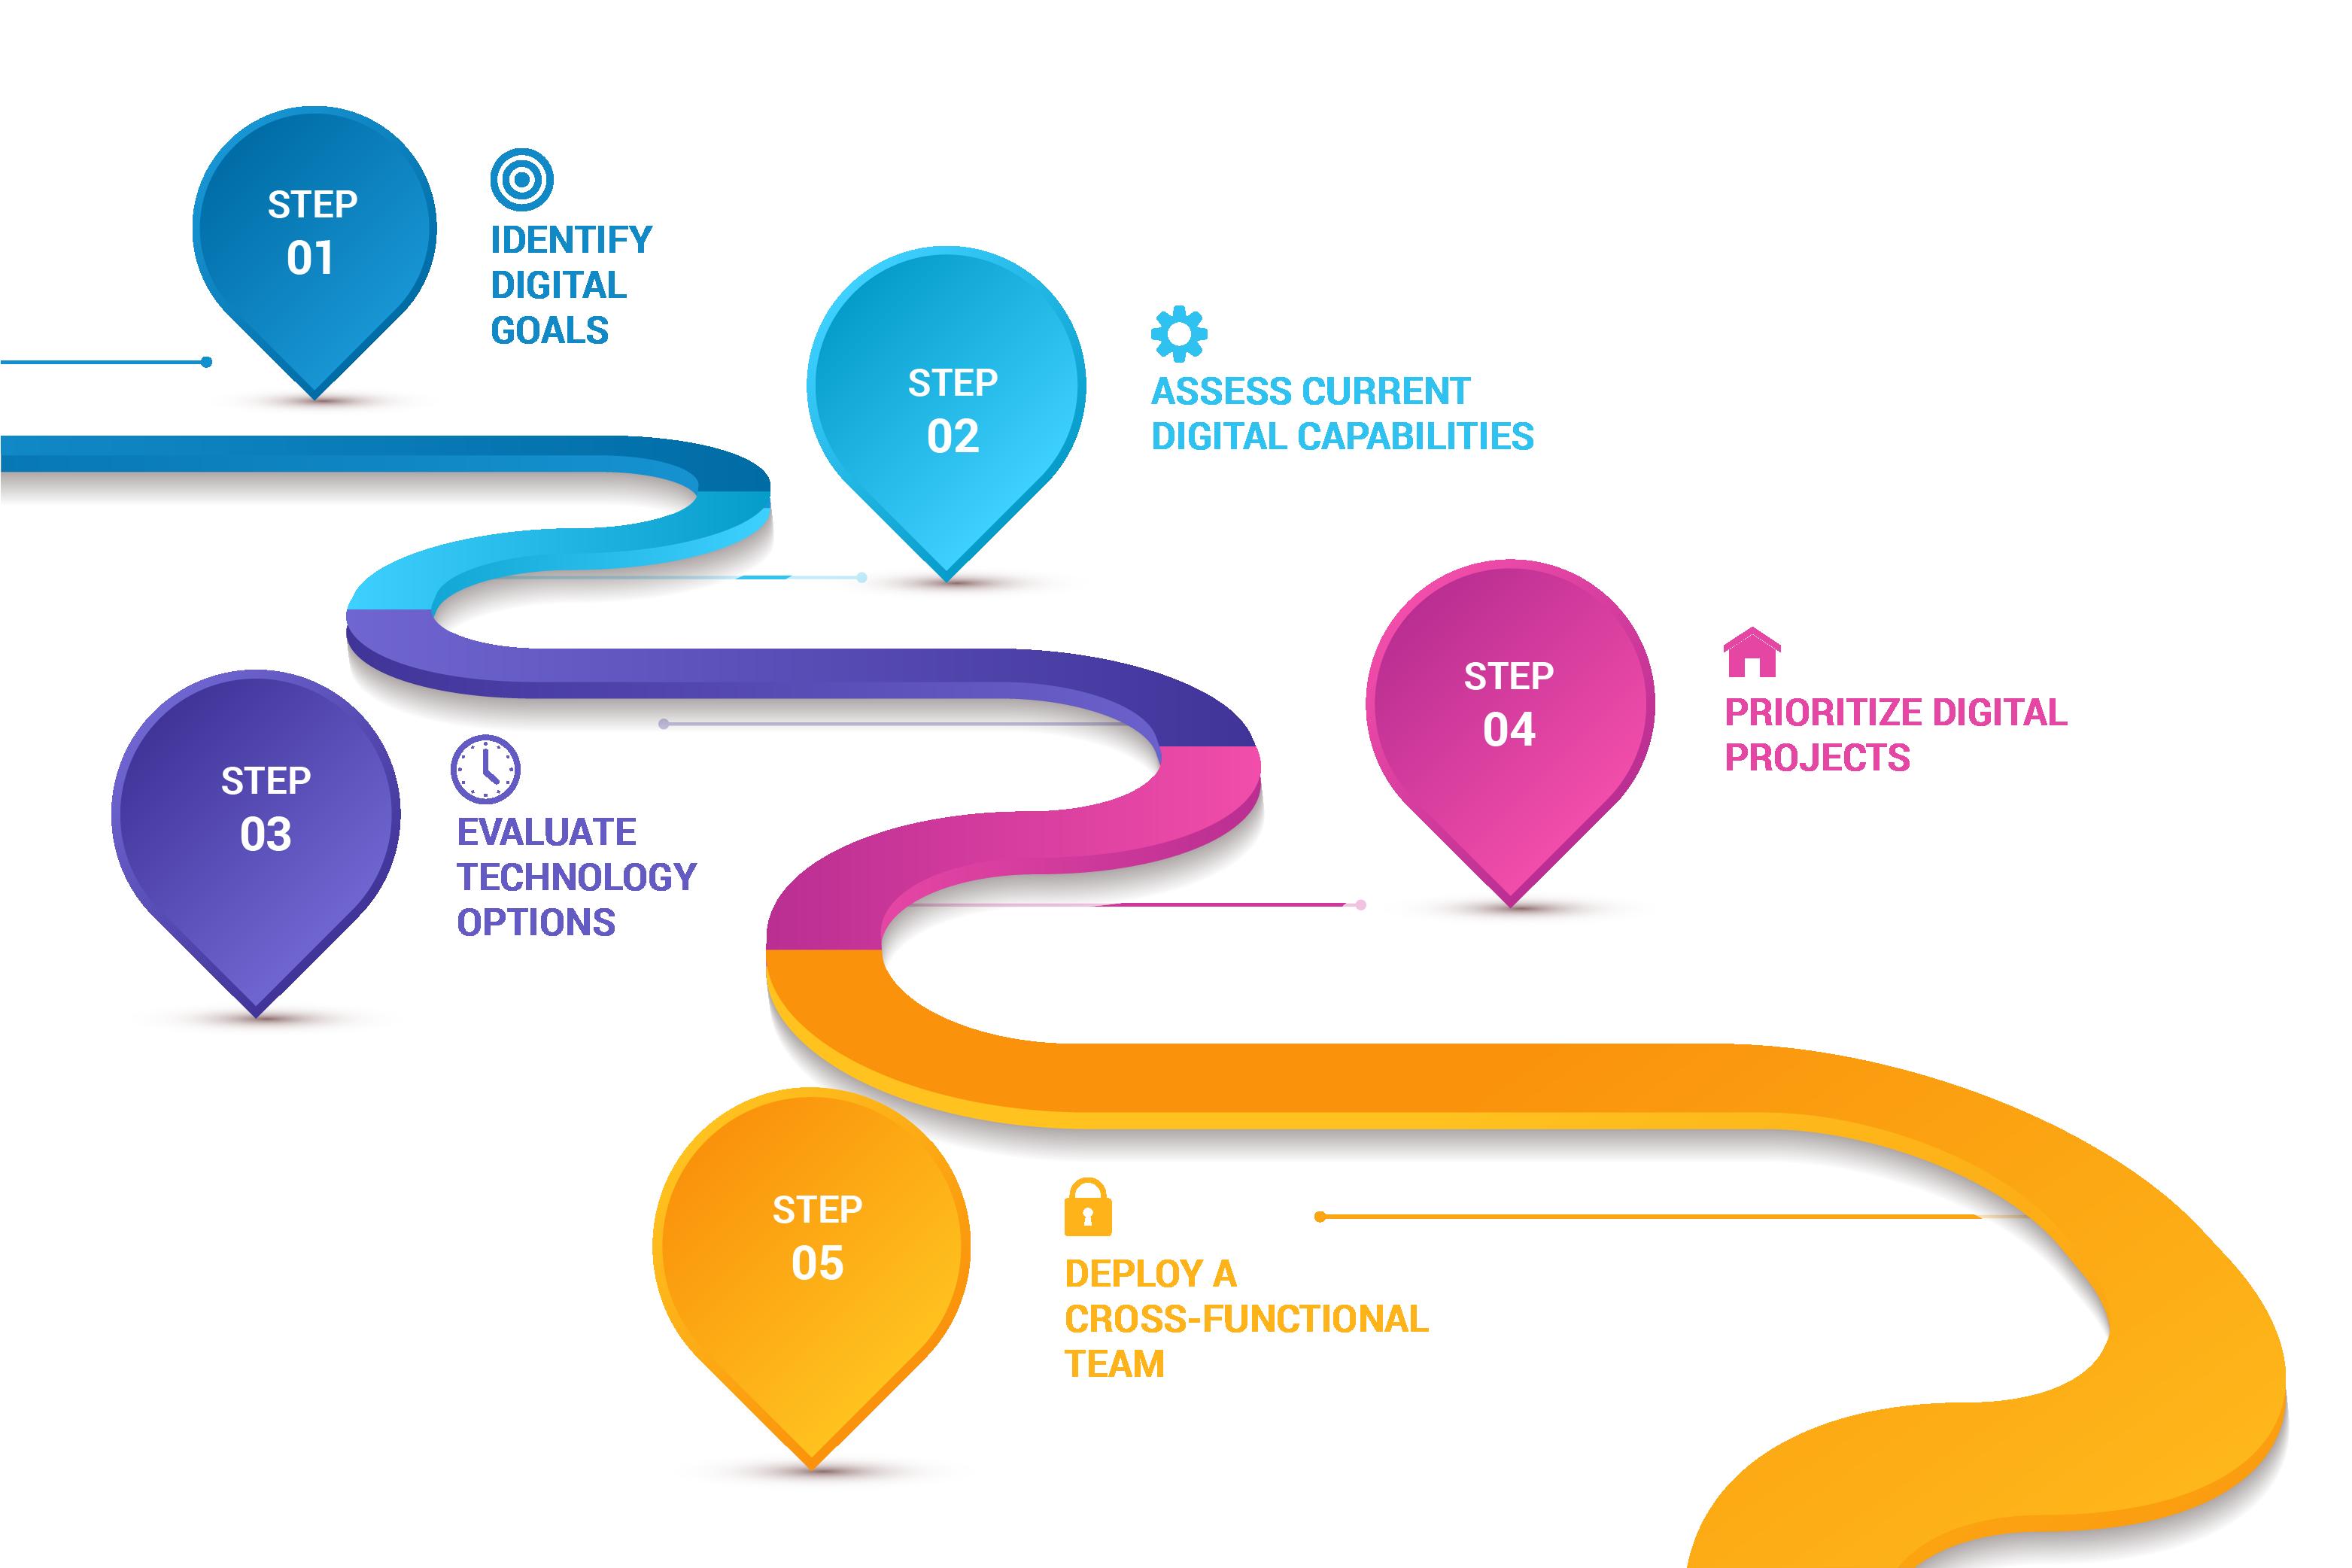 Roadmap to Digitalization